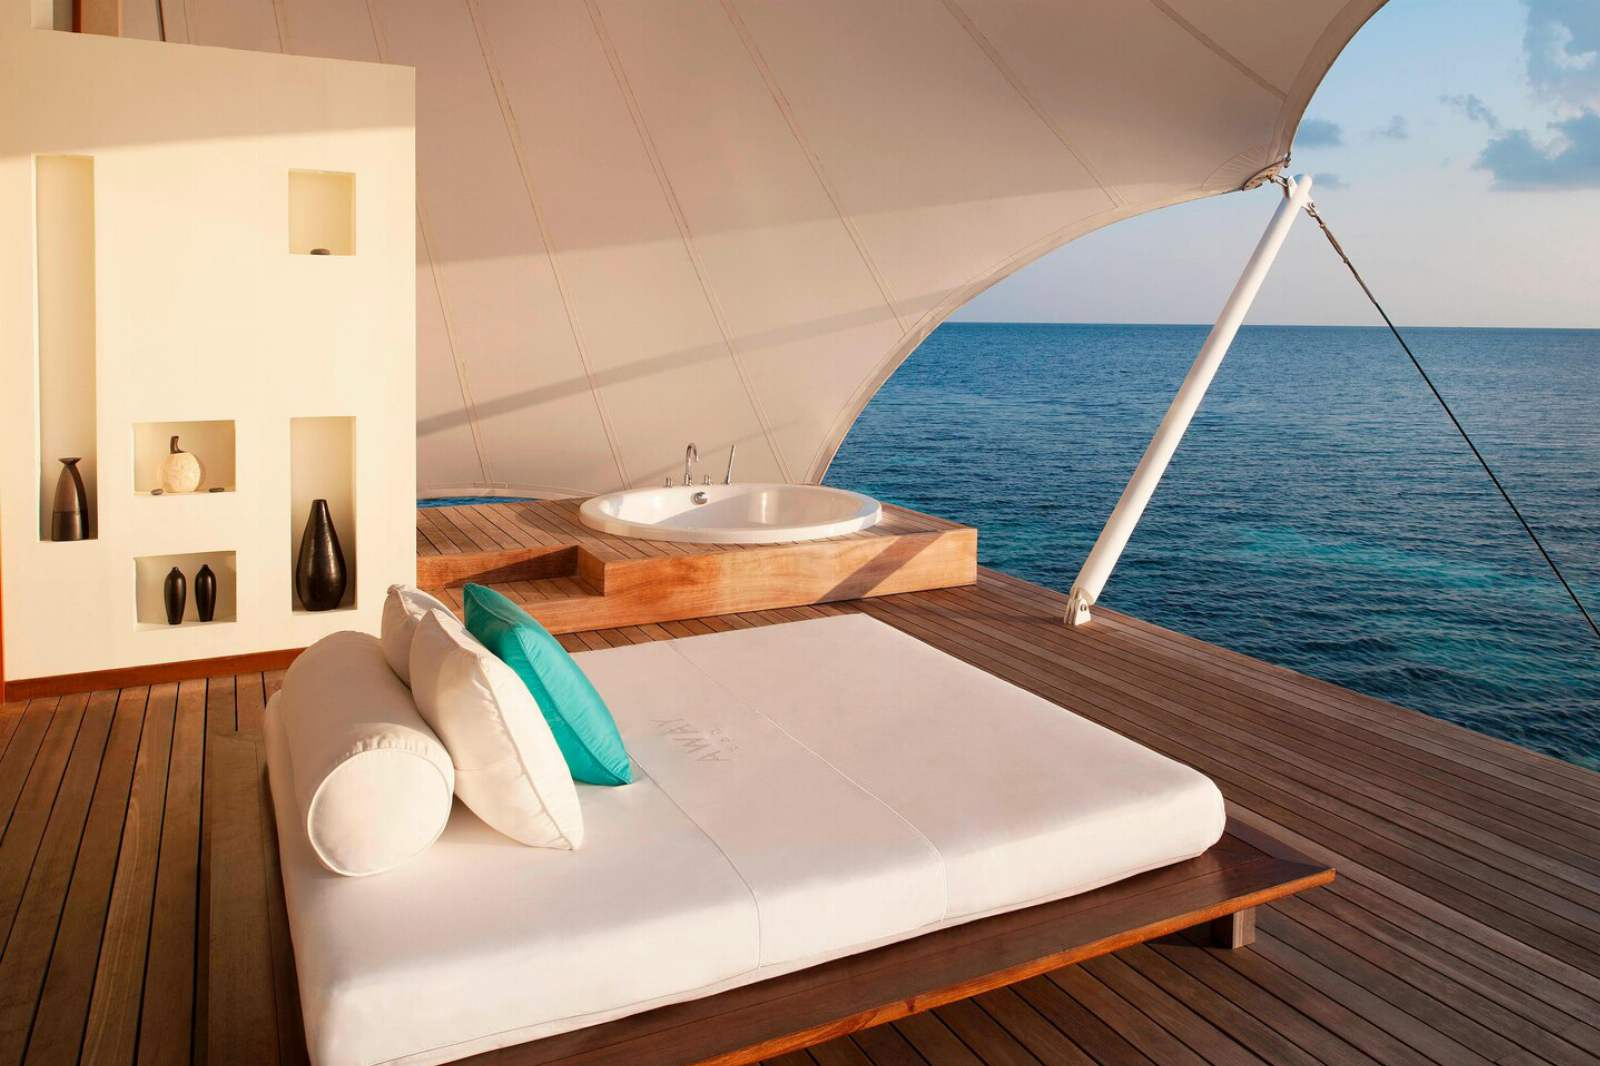 W Maldives - AWAY Spa Treatment Room